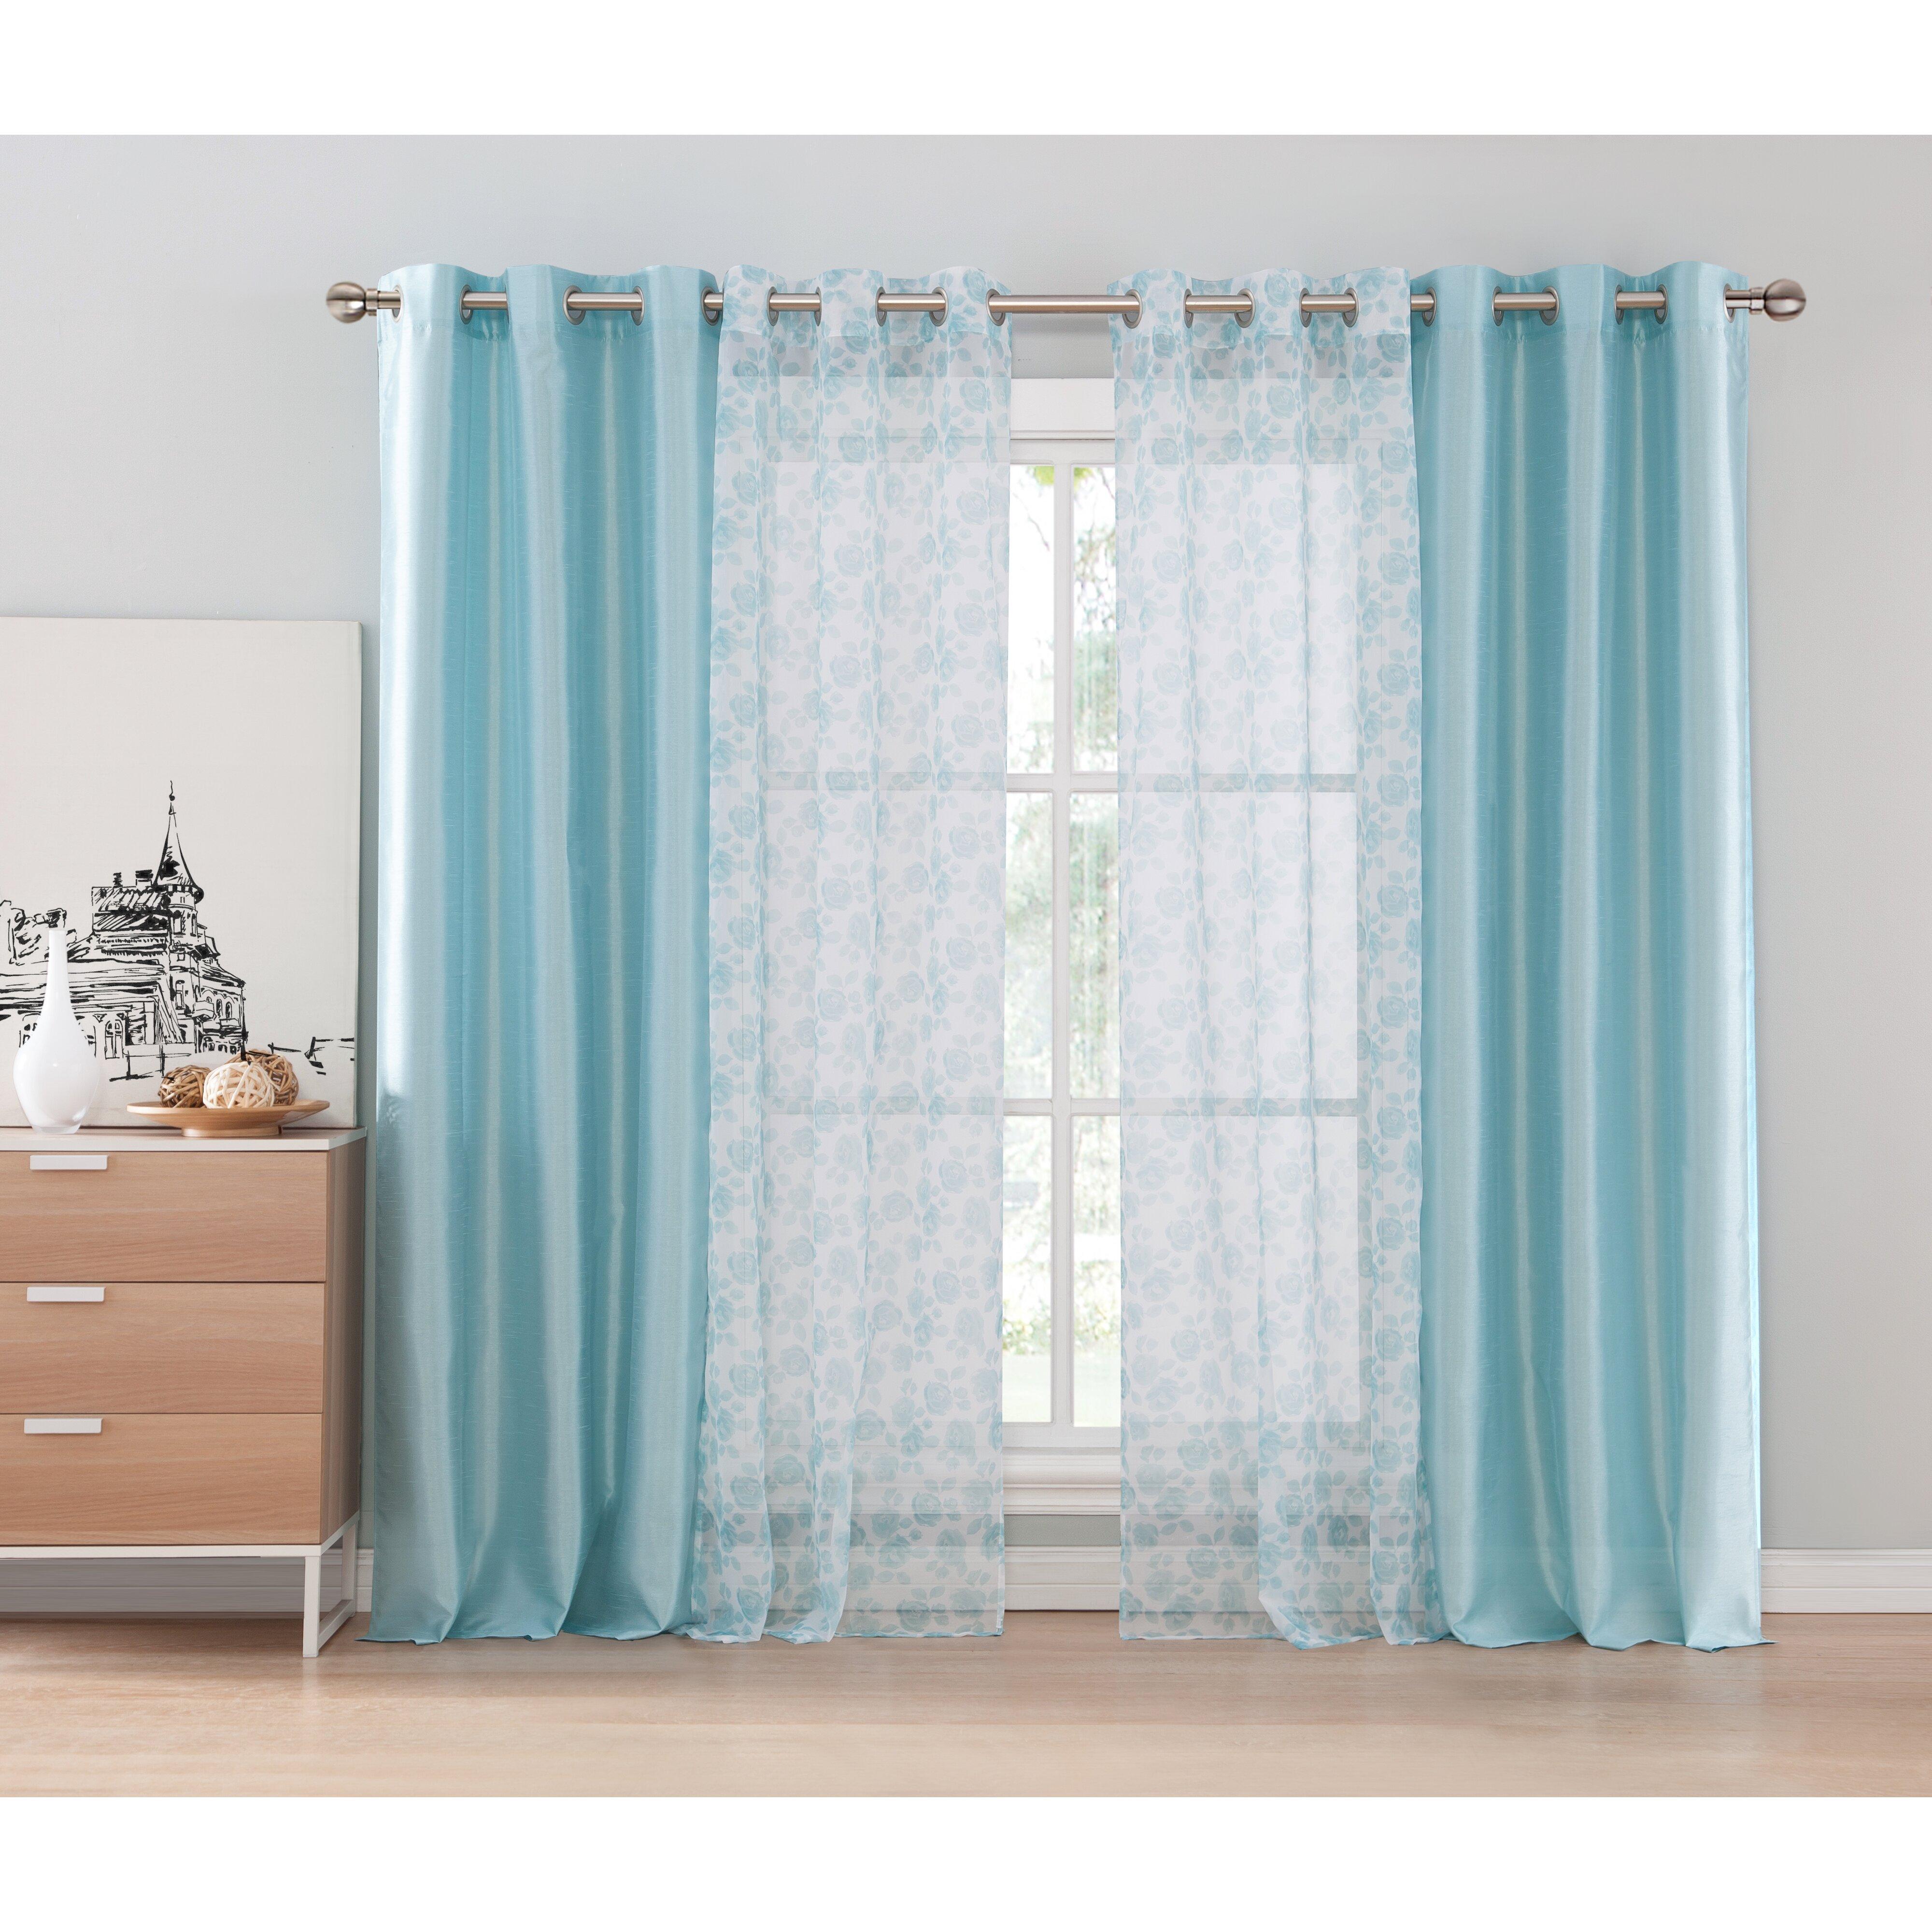 Hamilton 3 Piece Kitchen Curtain Set Available In 4: DR International Amanda 4 Piece Curtain Panel Set